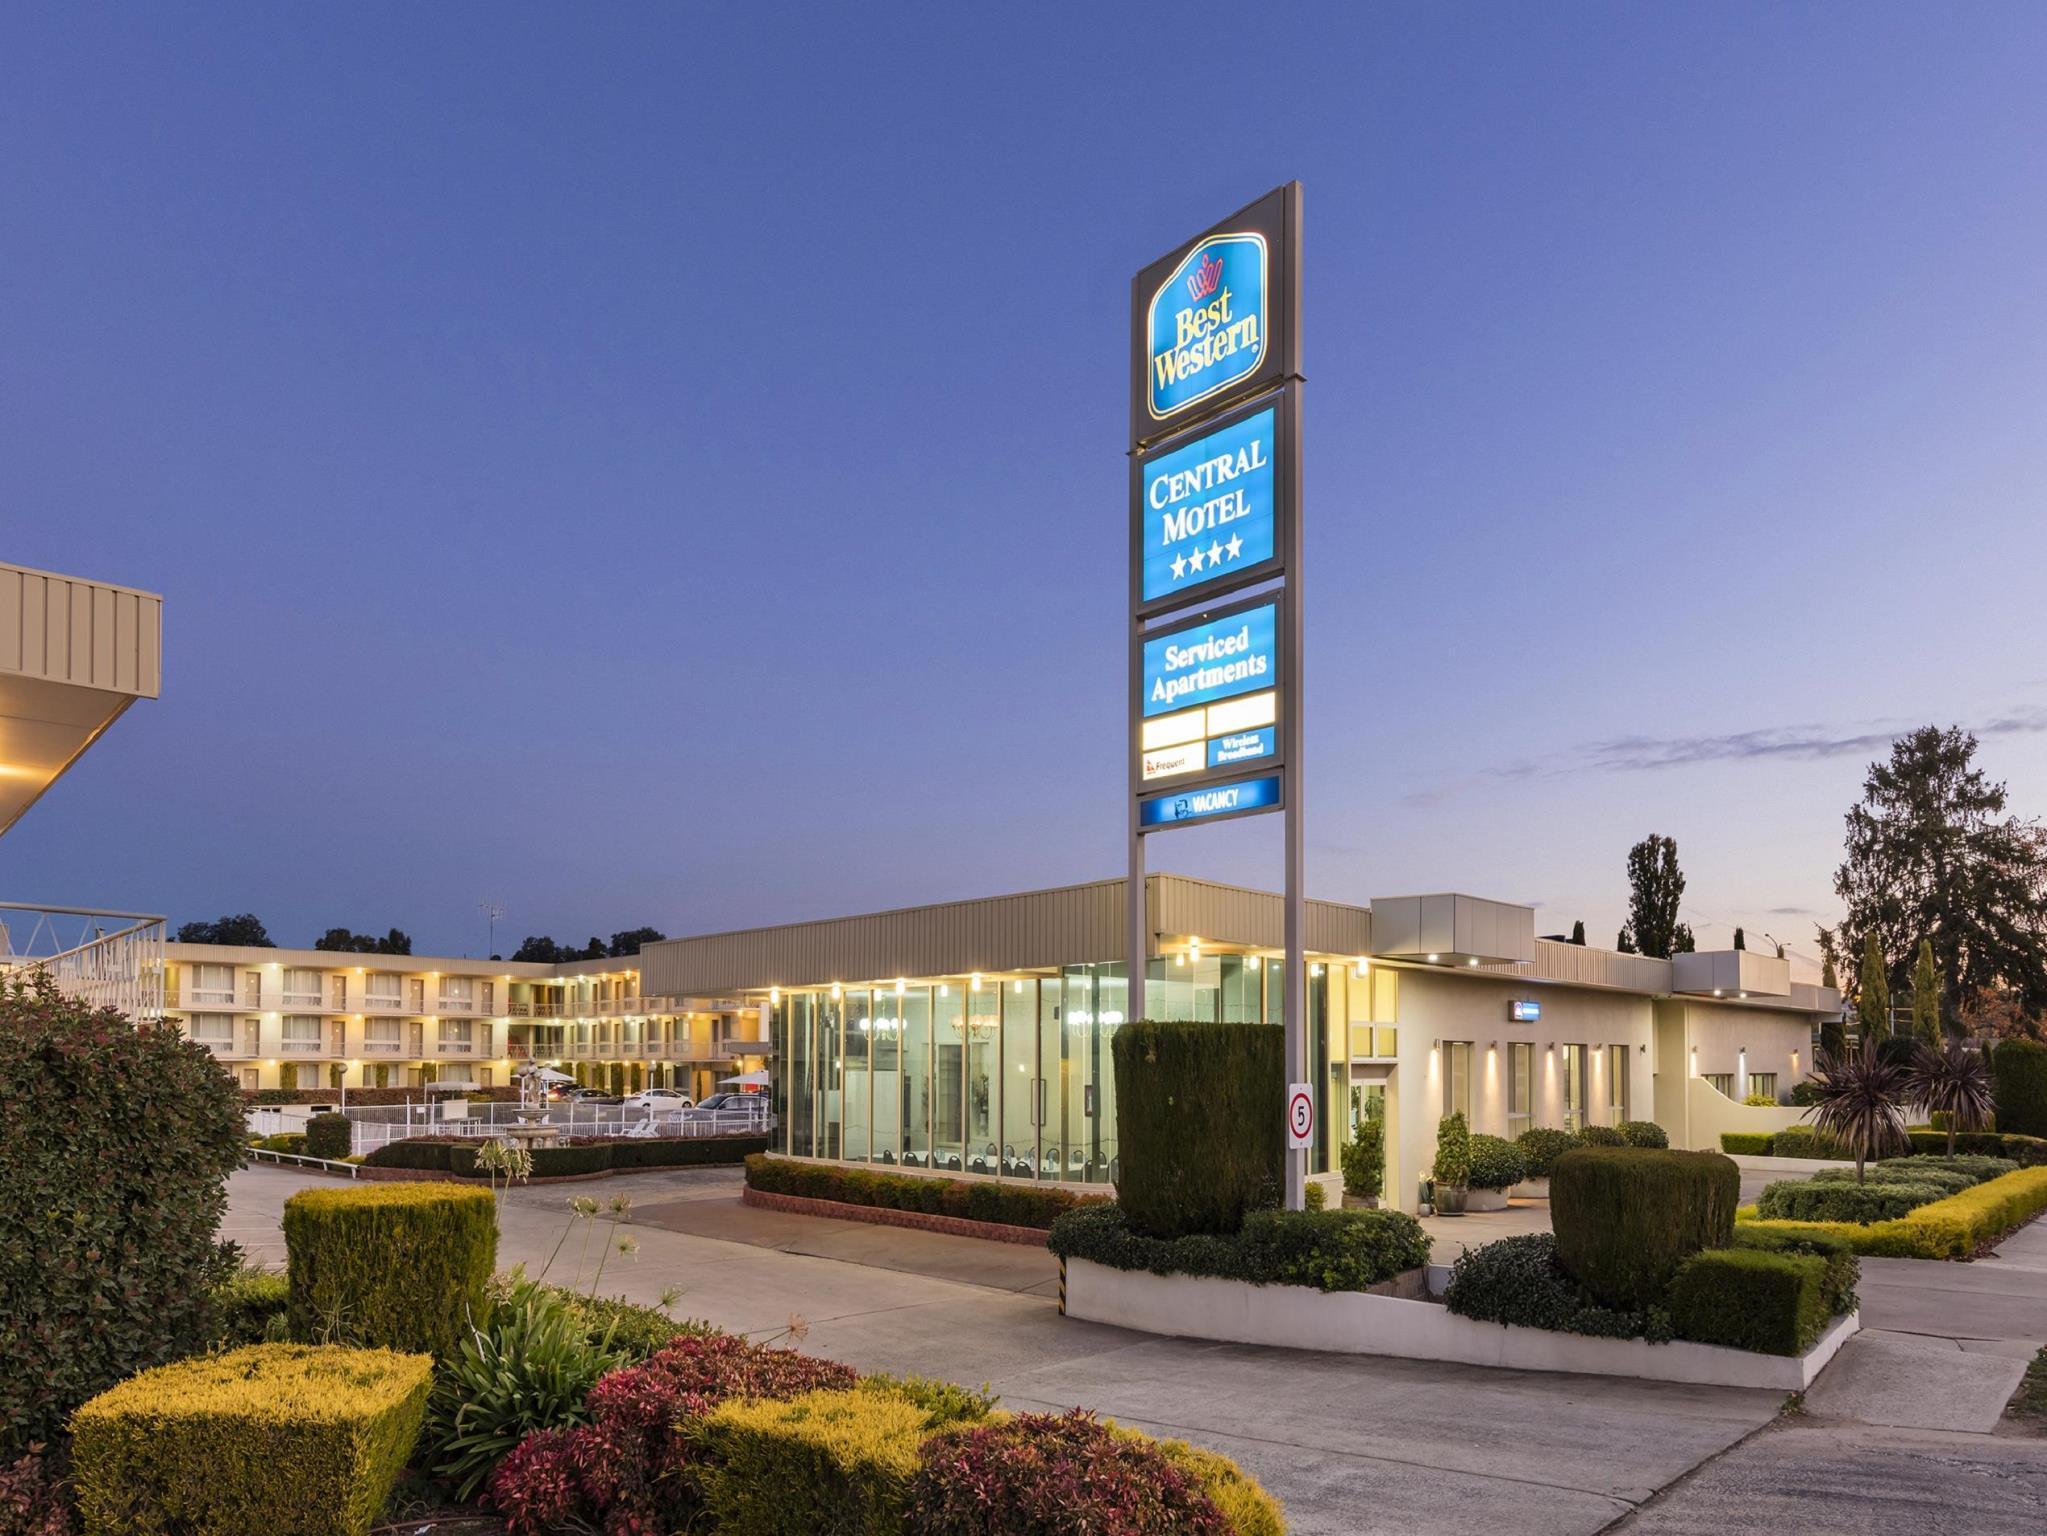 Best Western Central Motel & Apartments, Queanbeyan